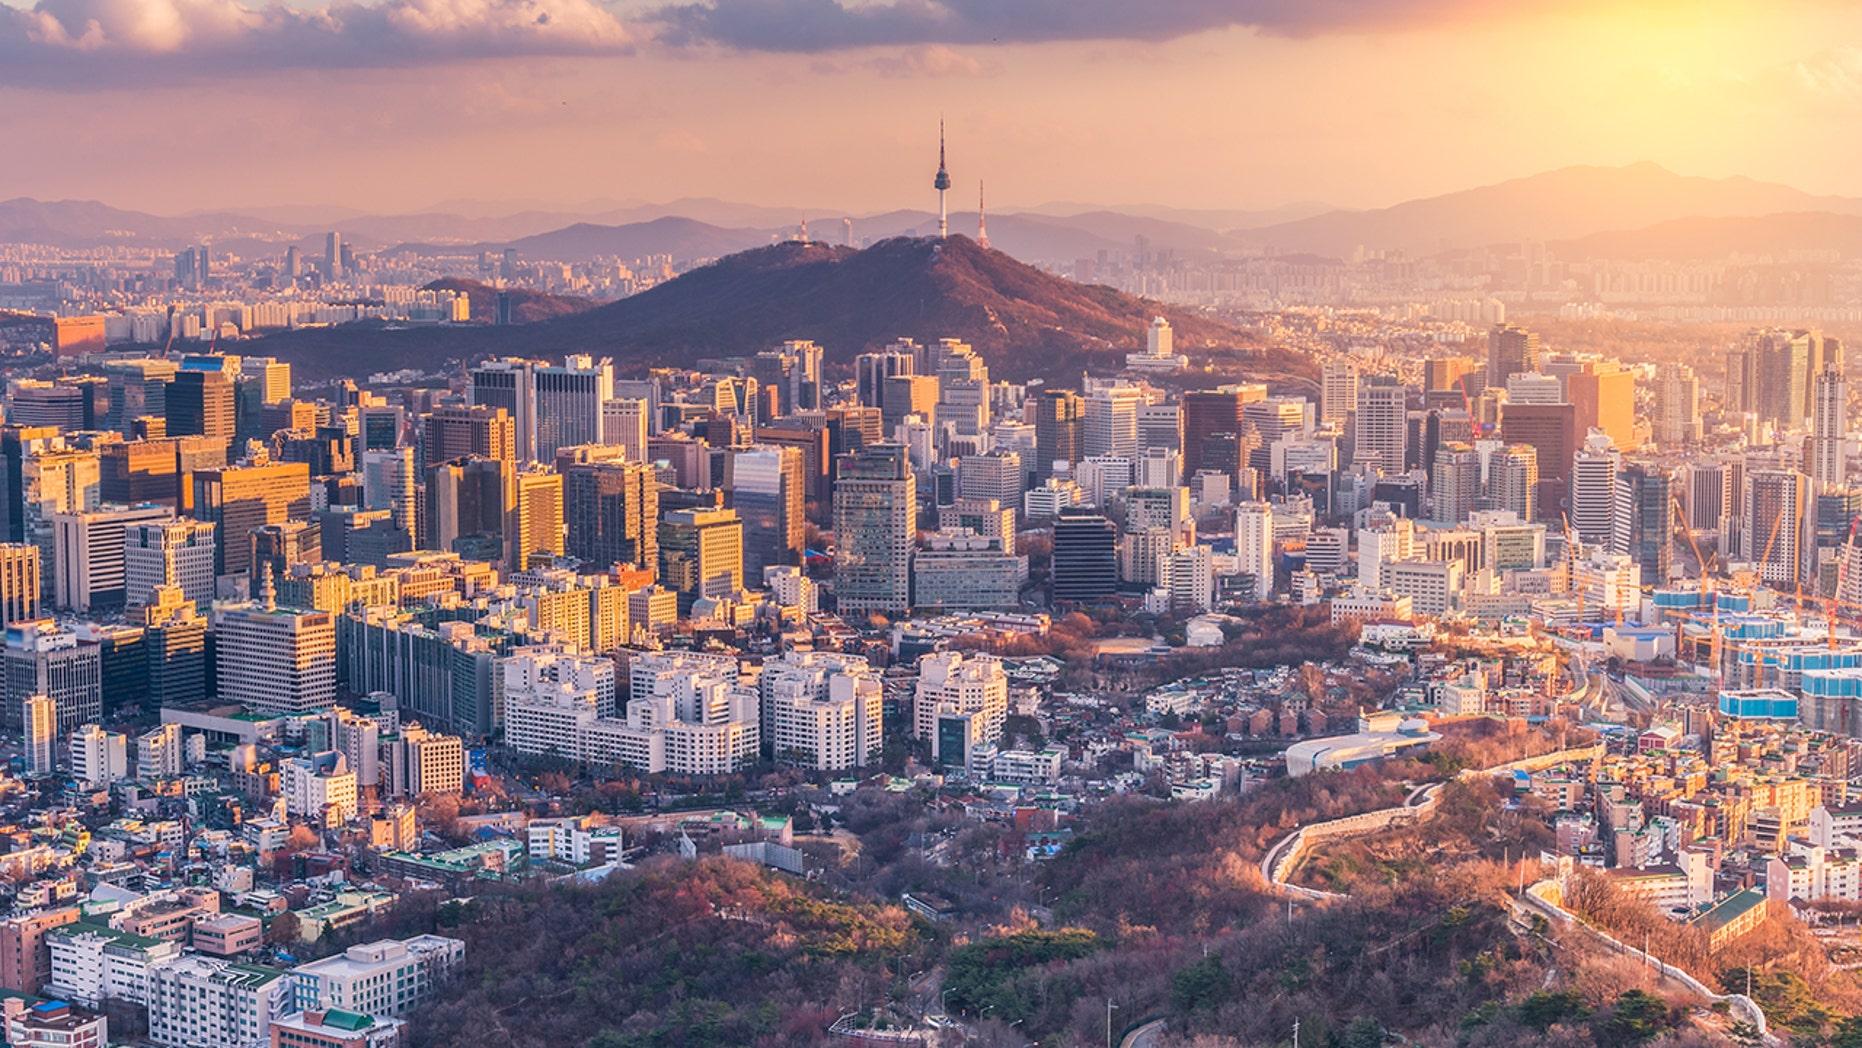 FILE -- Sunset at Seoul City Skyline, South Korea (iStock)